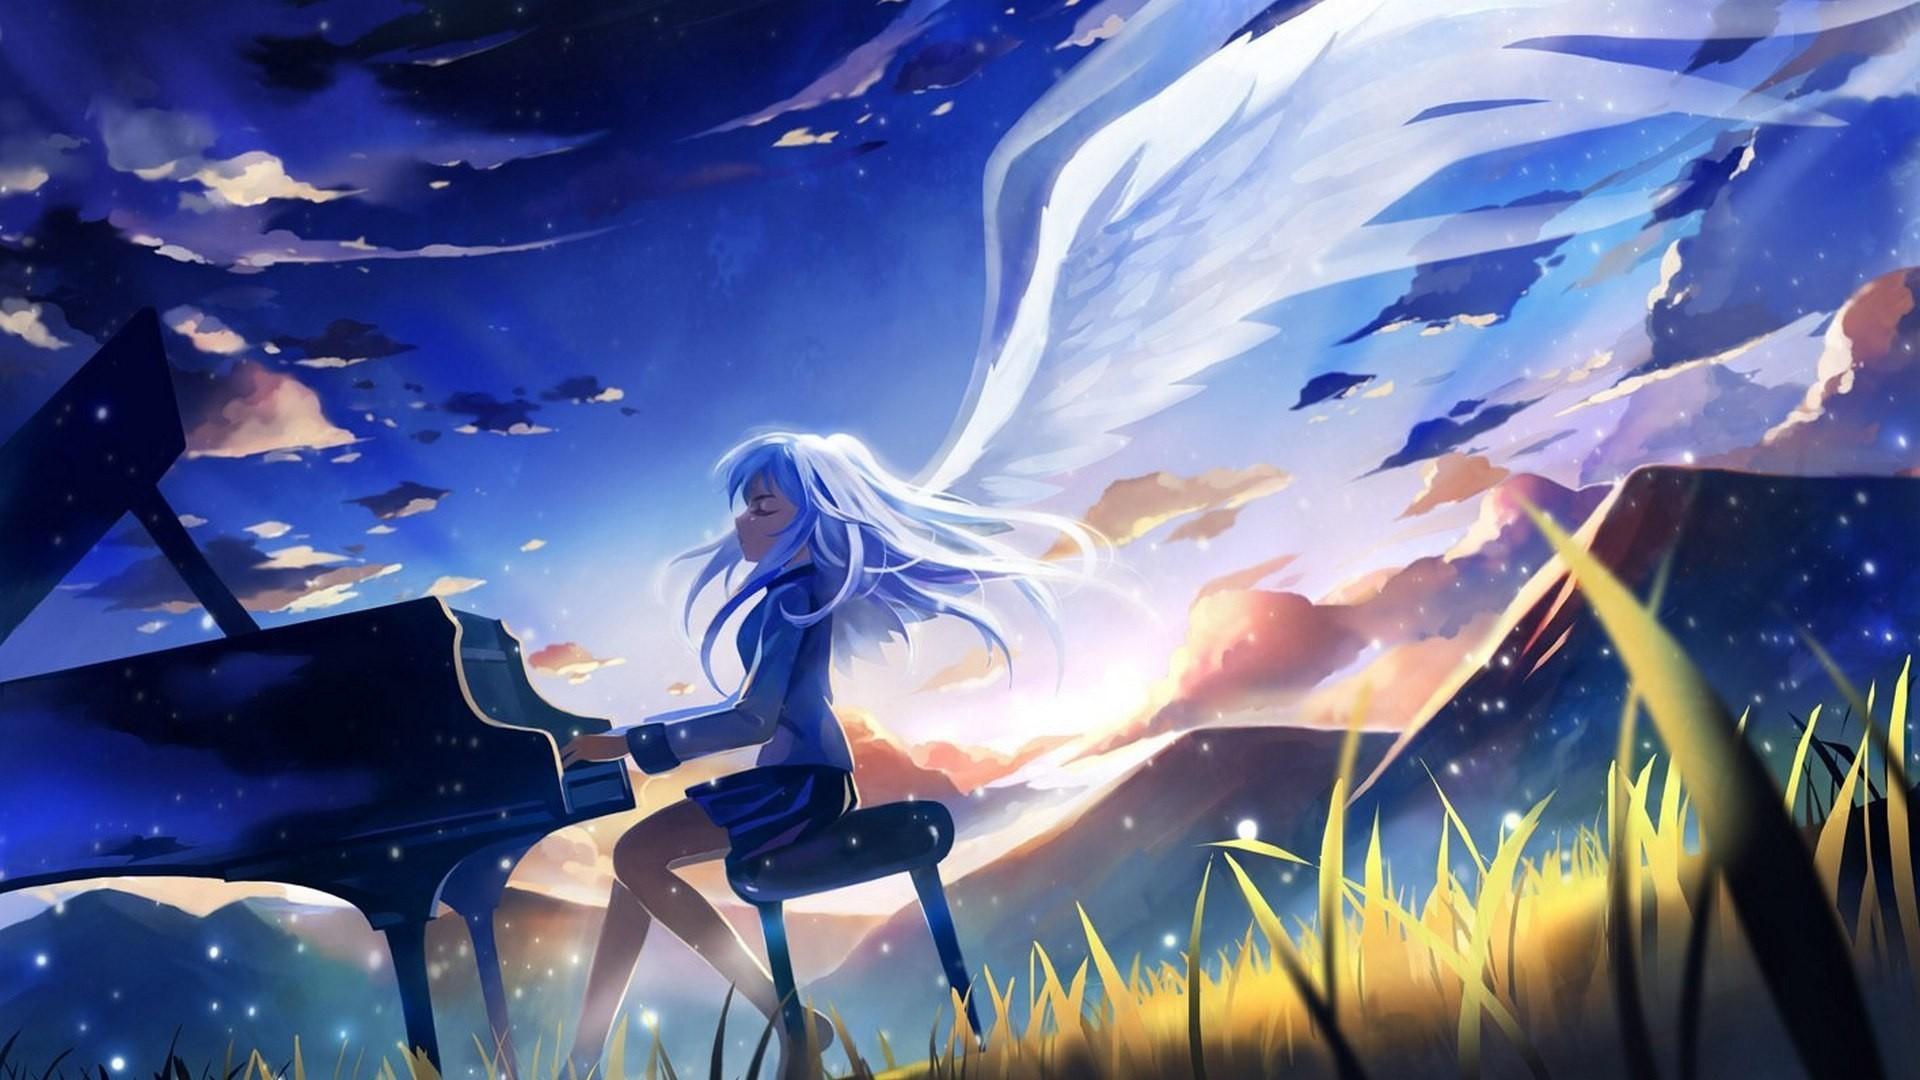 Wallpaper Illustration Anime Girls Wings Angel Music Manga